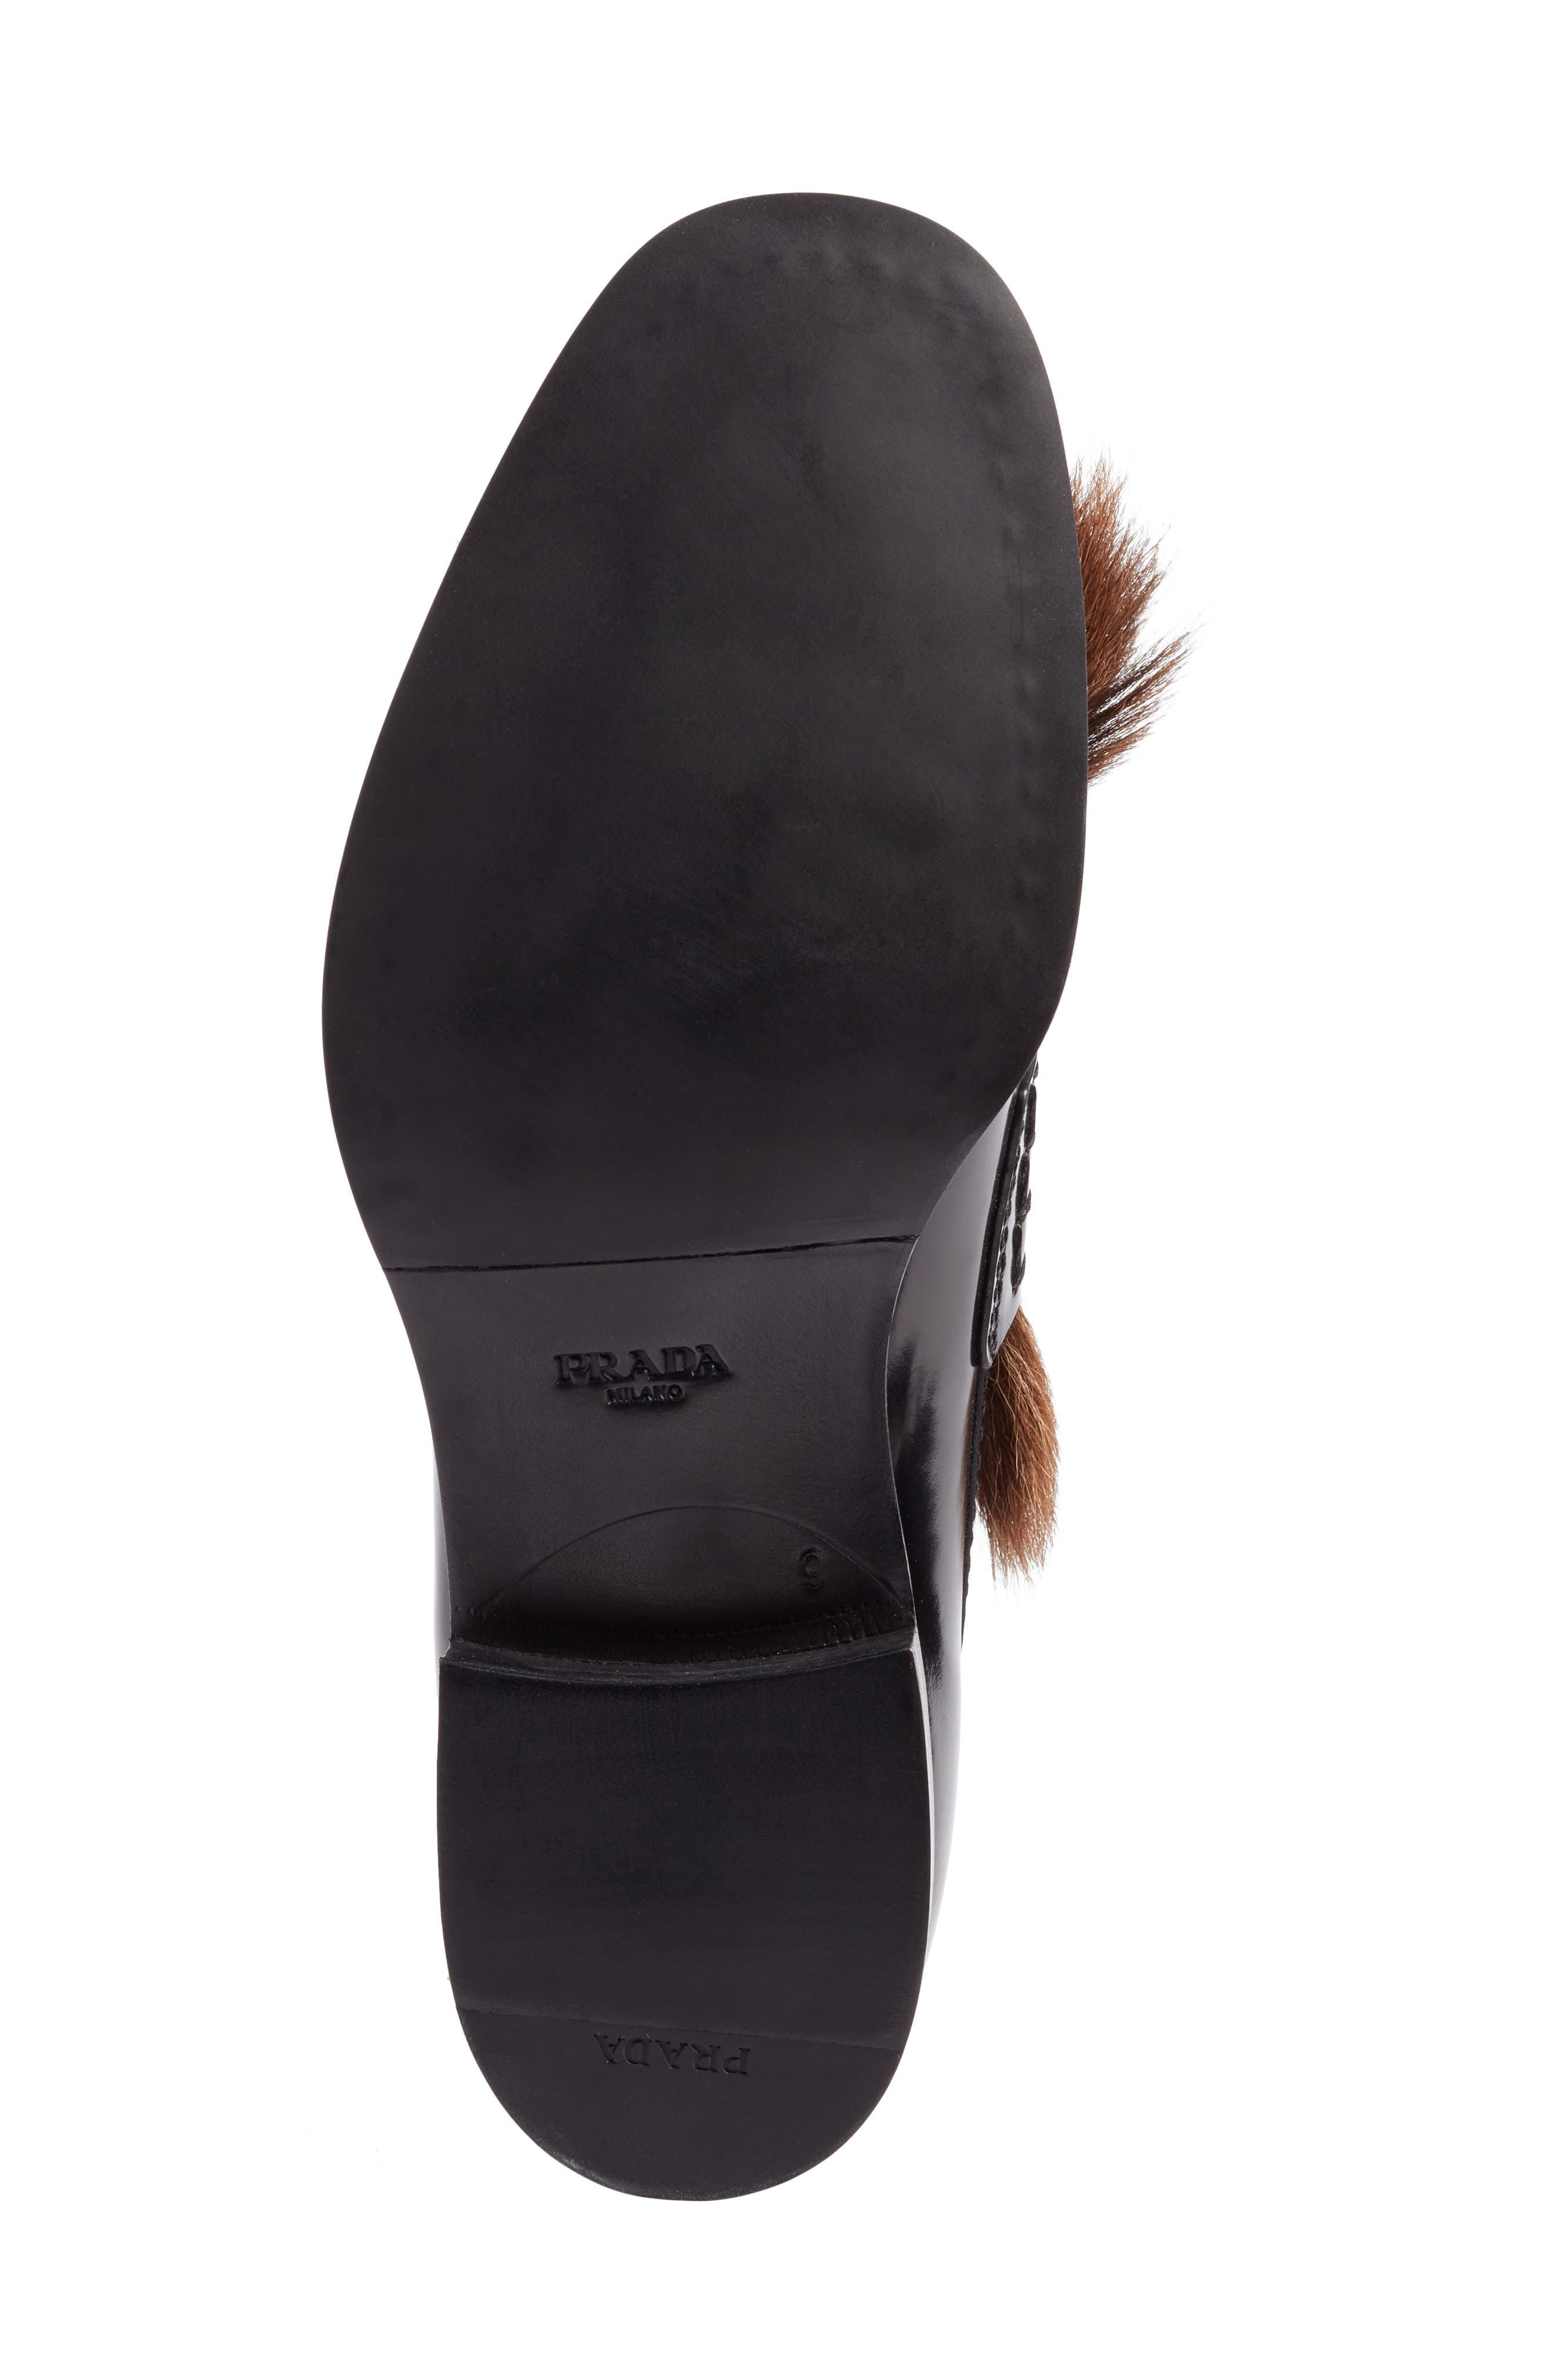 Tassel Loafer with Genuine Goat Hair Trim,                             Alternate thumbnail 6, color,                             001